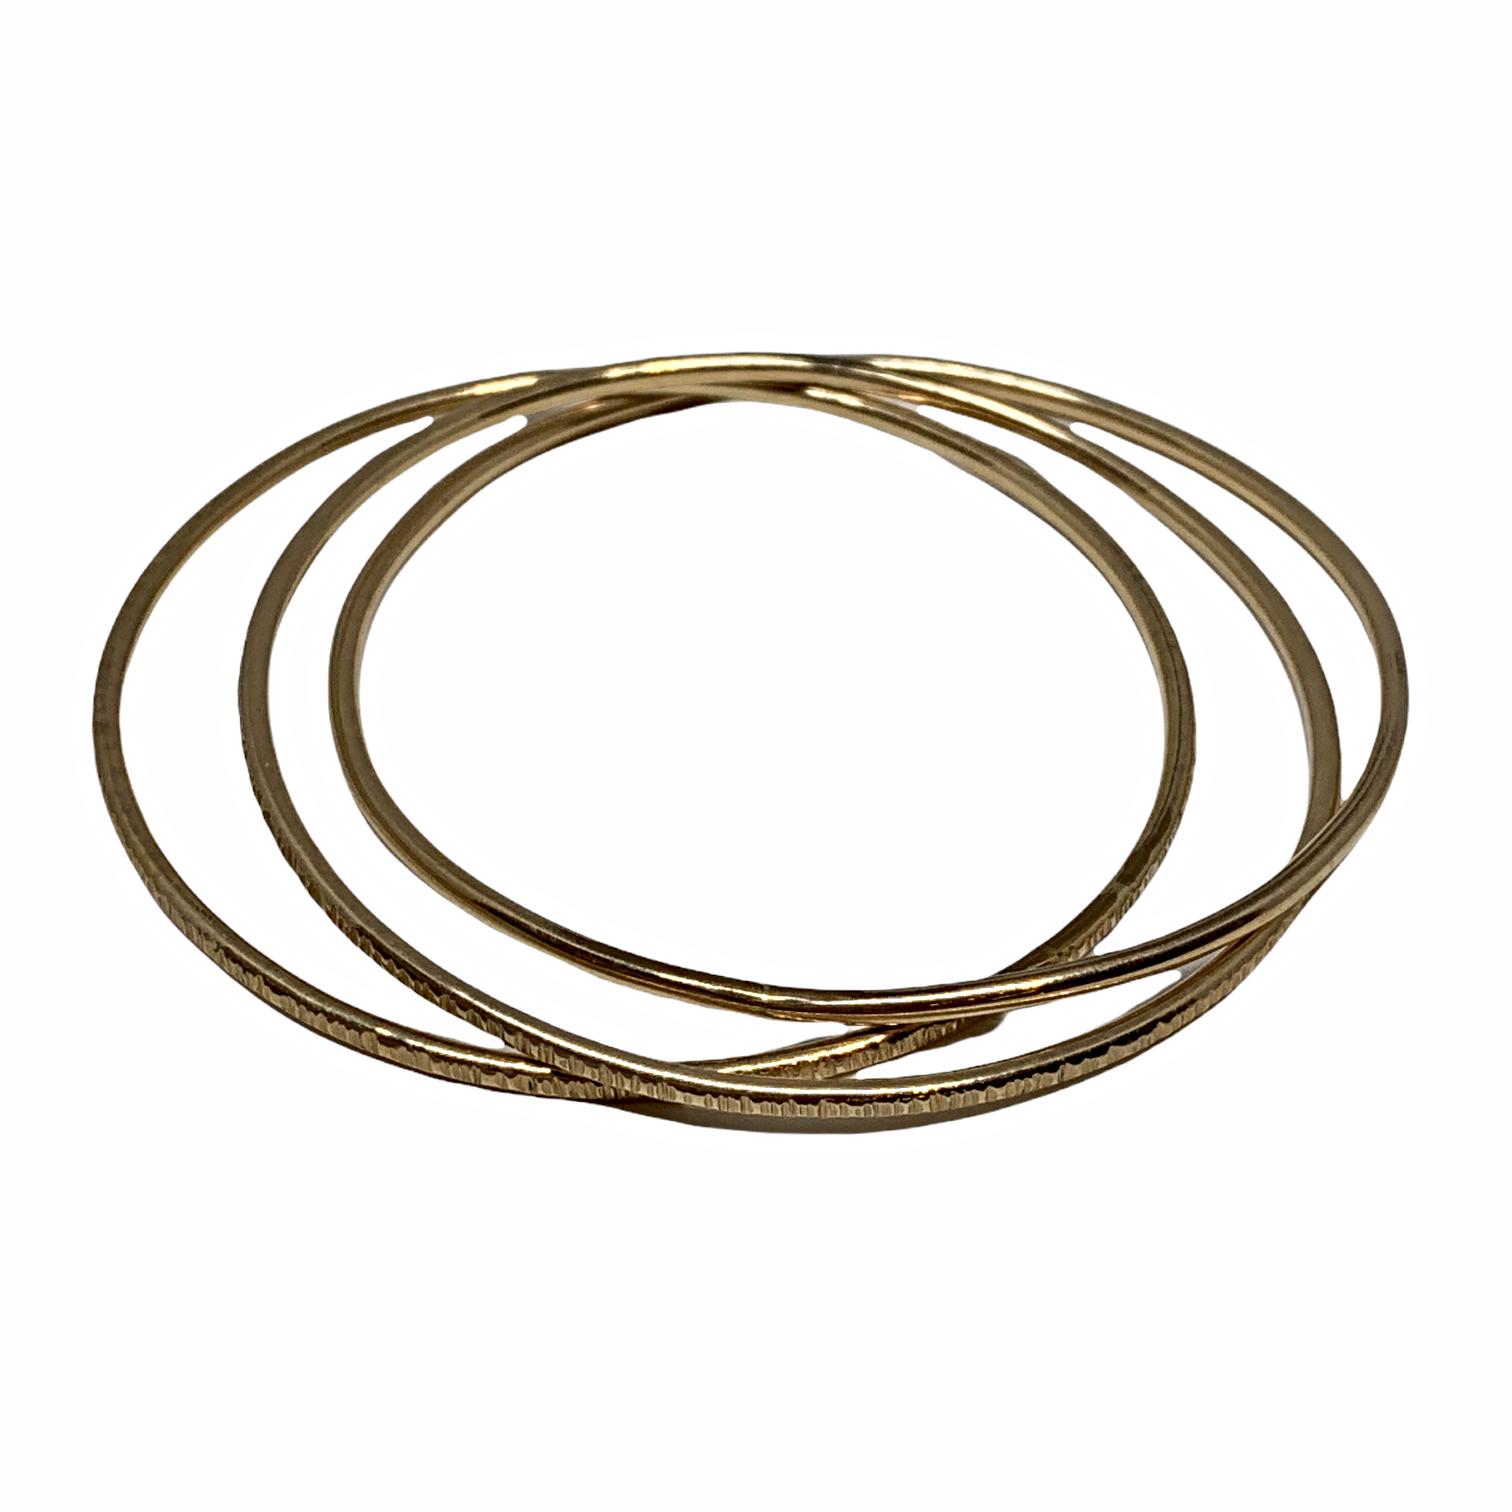 Handmade interlocking 14kt gold-fill bangles by Karyn Chopik | Effusion Art Gallery + Cast Glass Studio, Invermere BC